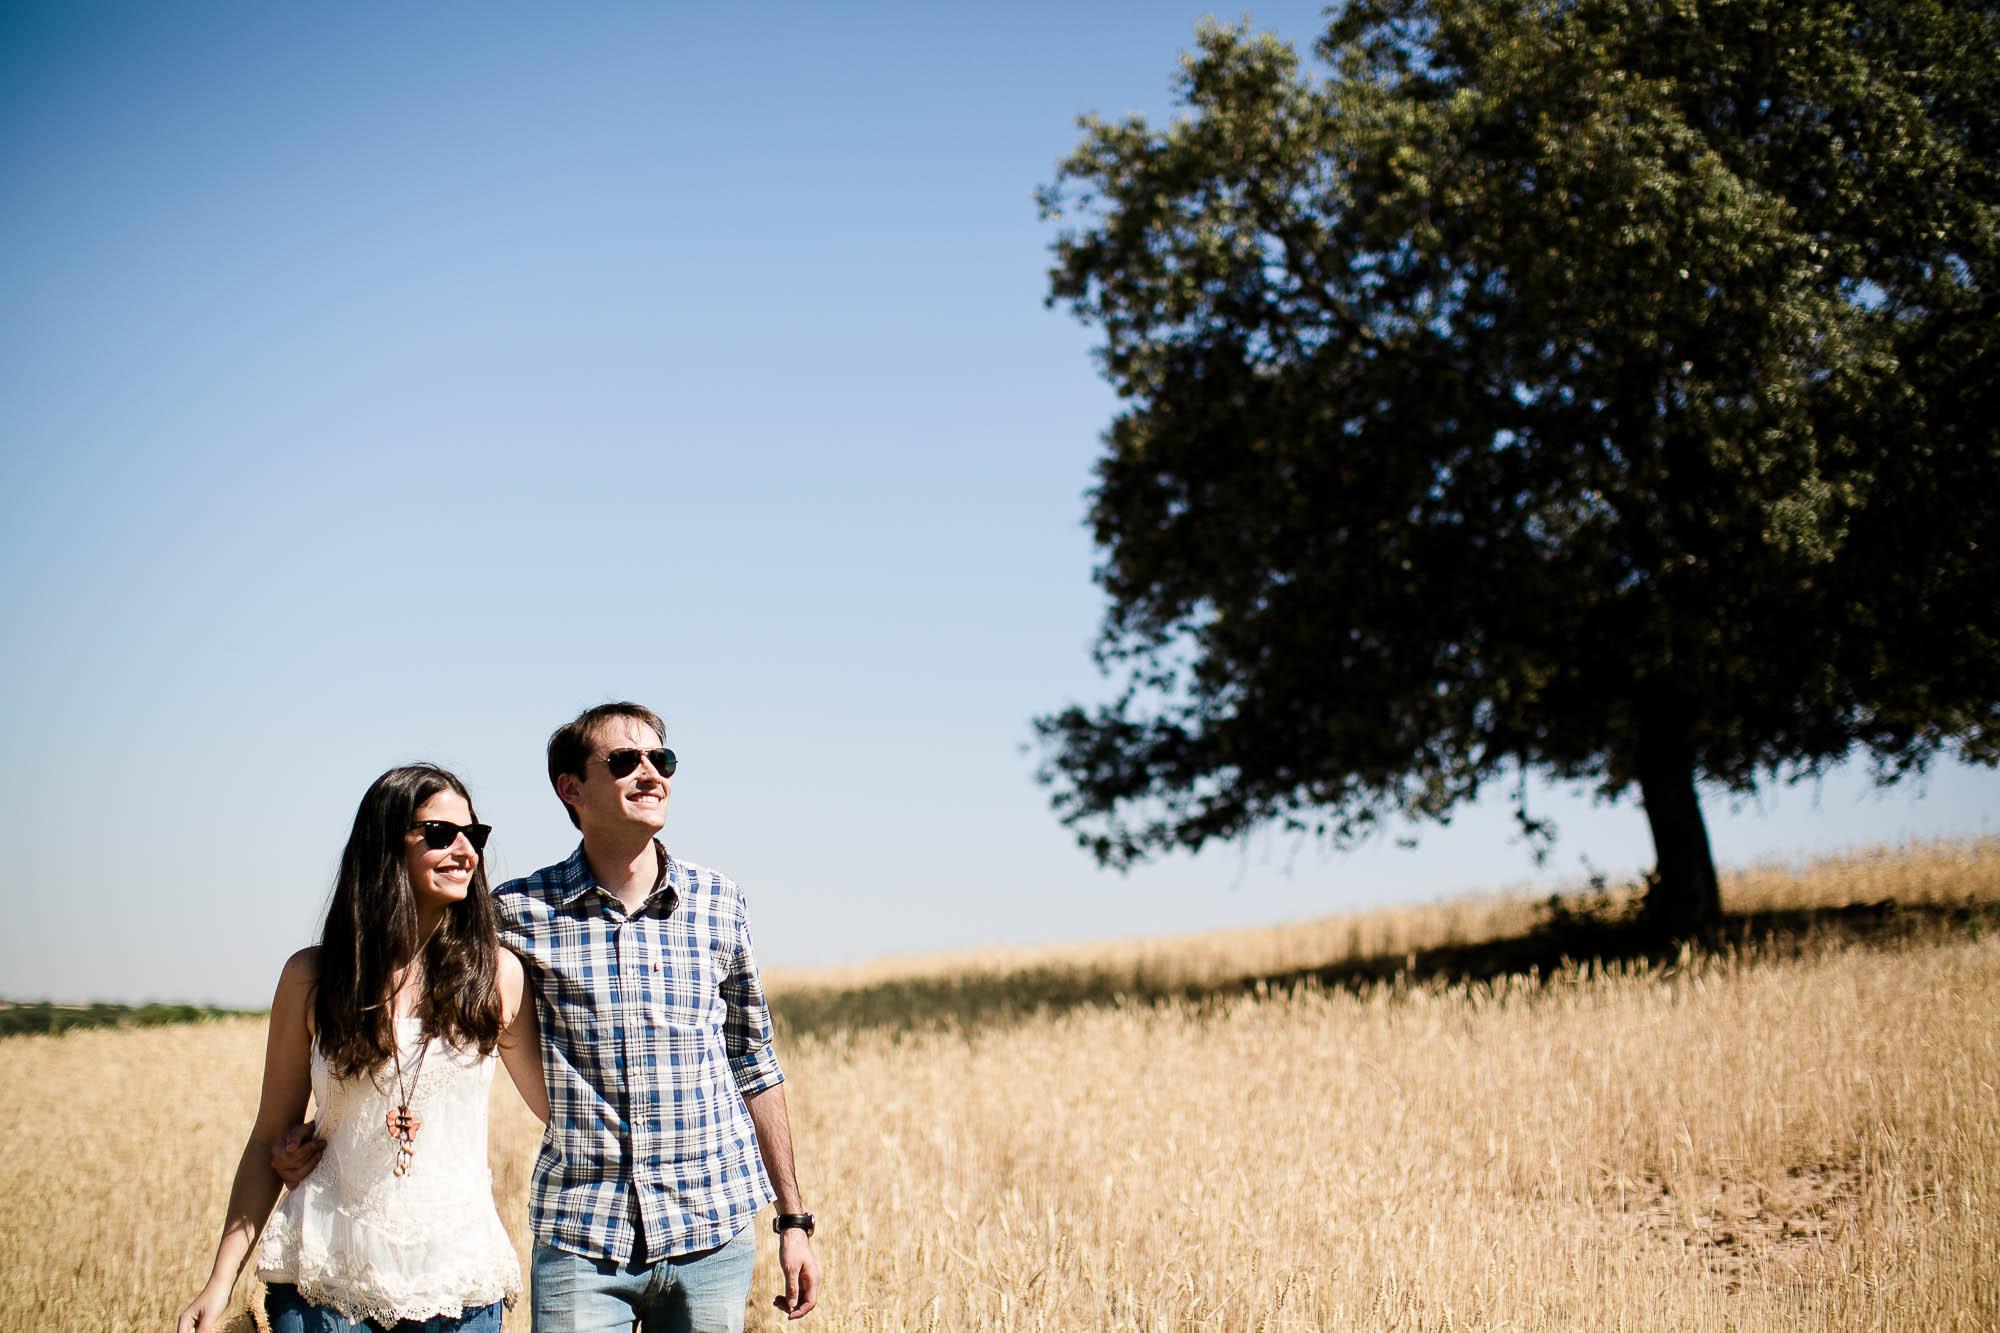 La pareja enamorada mira el paisaje